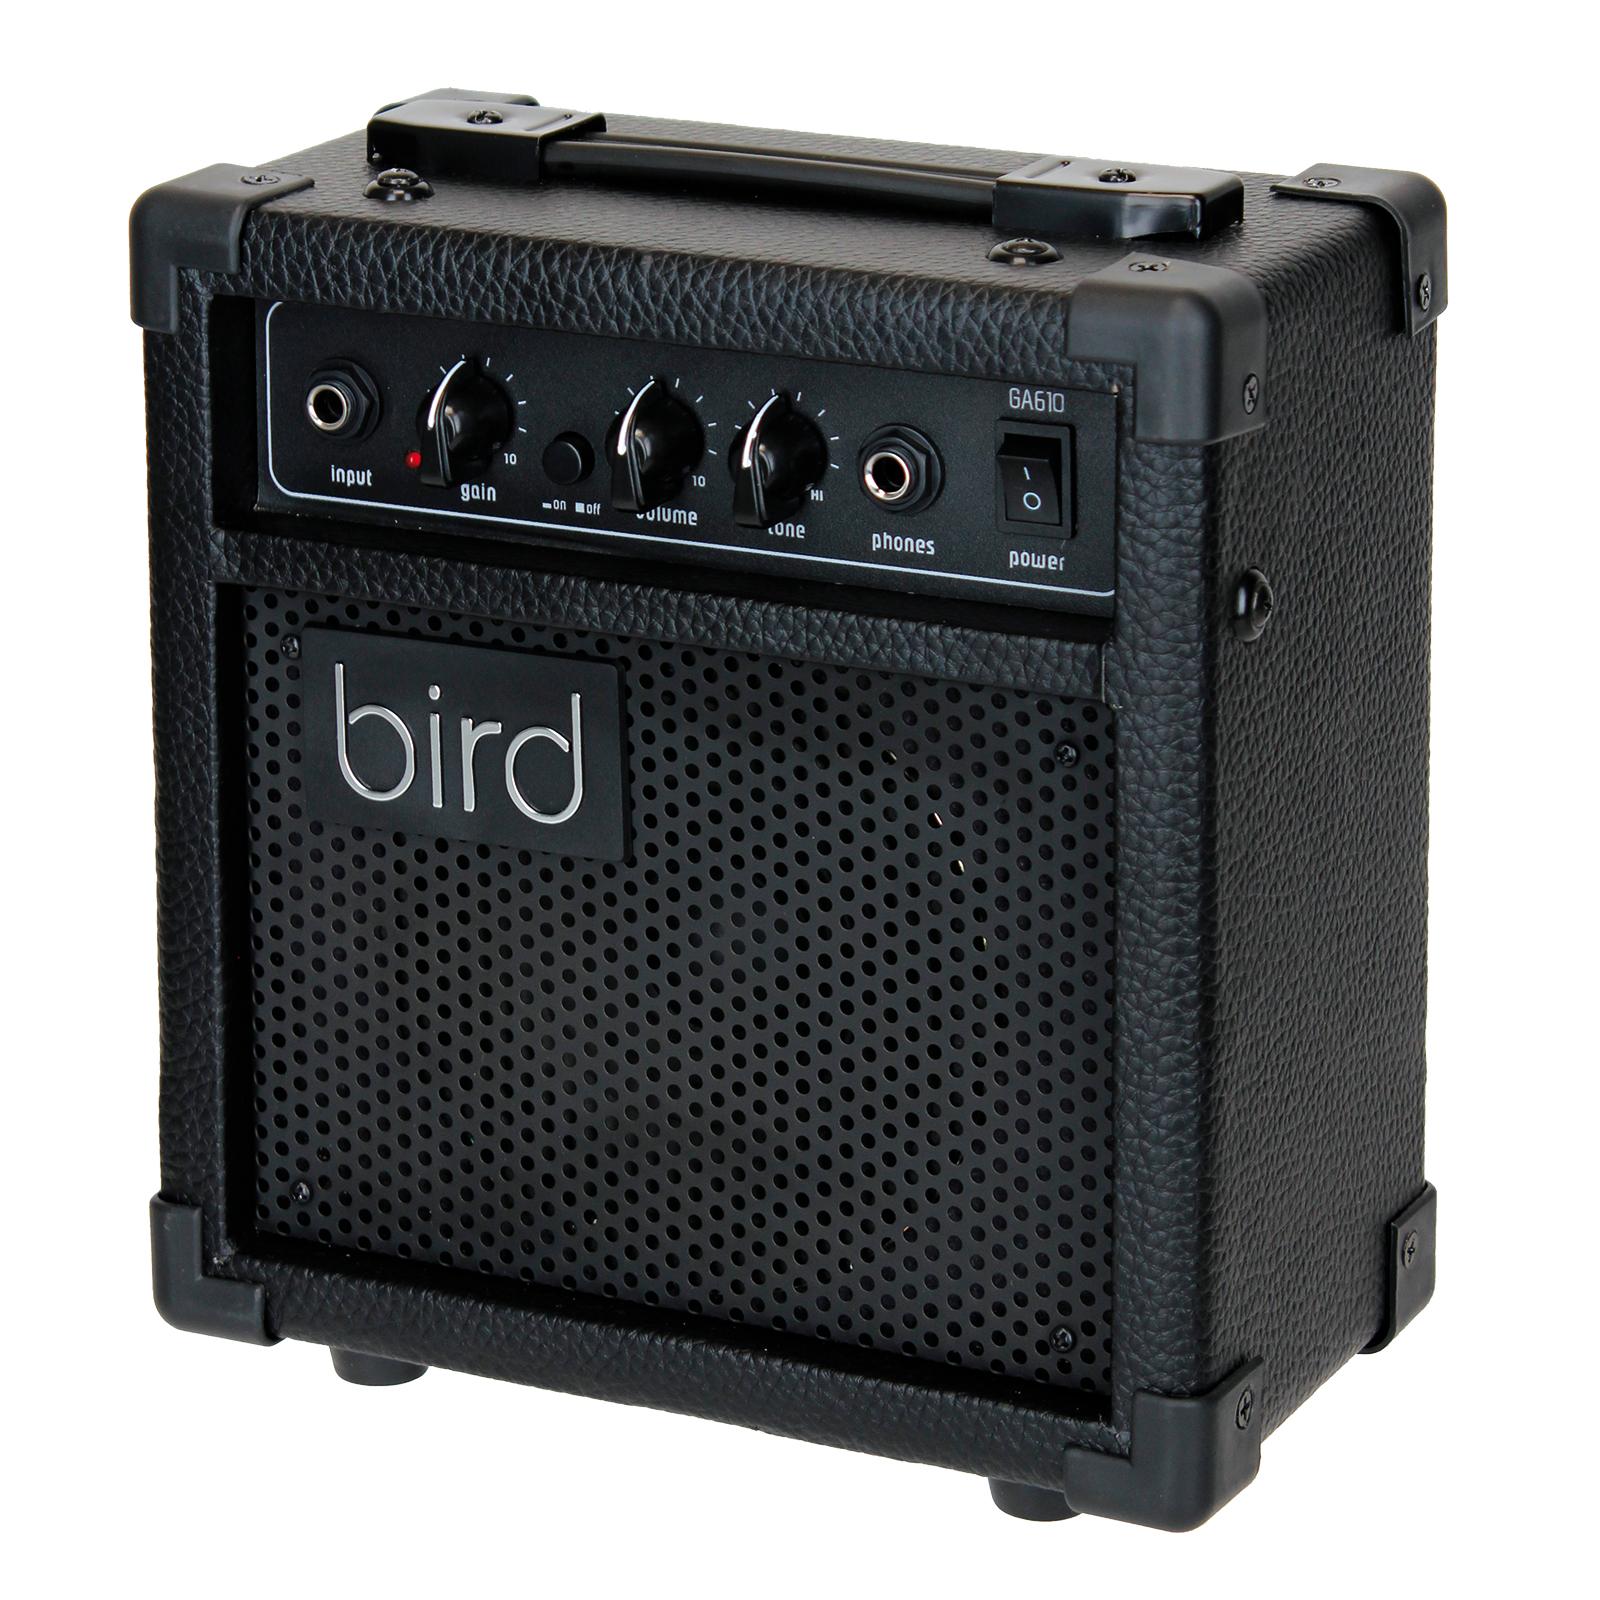 Bird Ga610